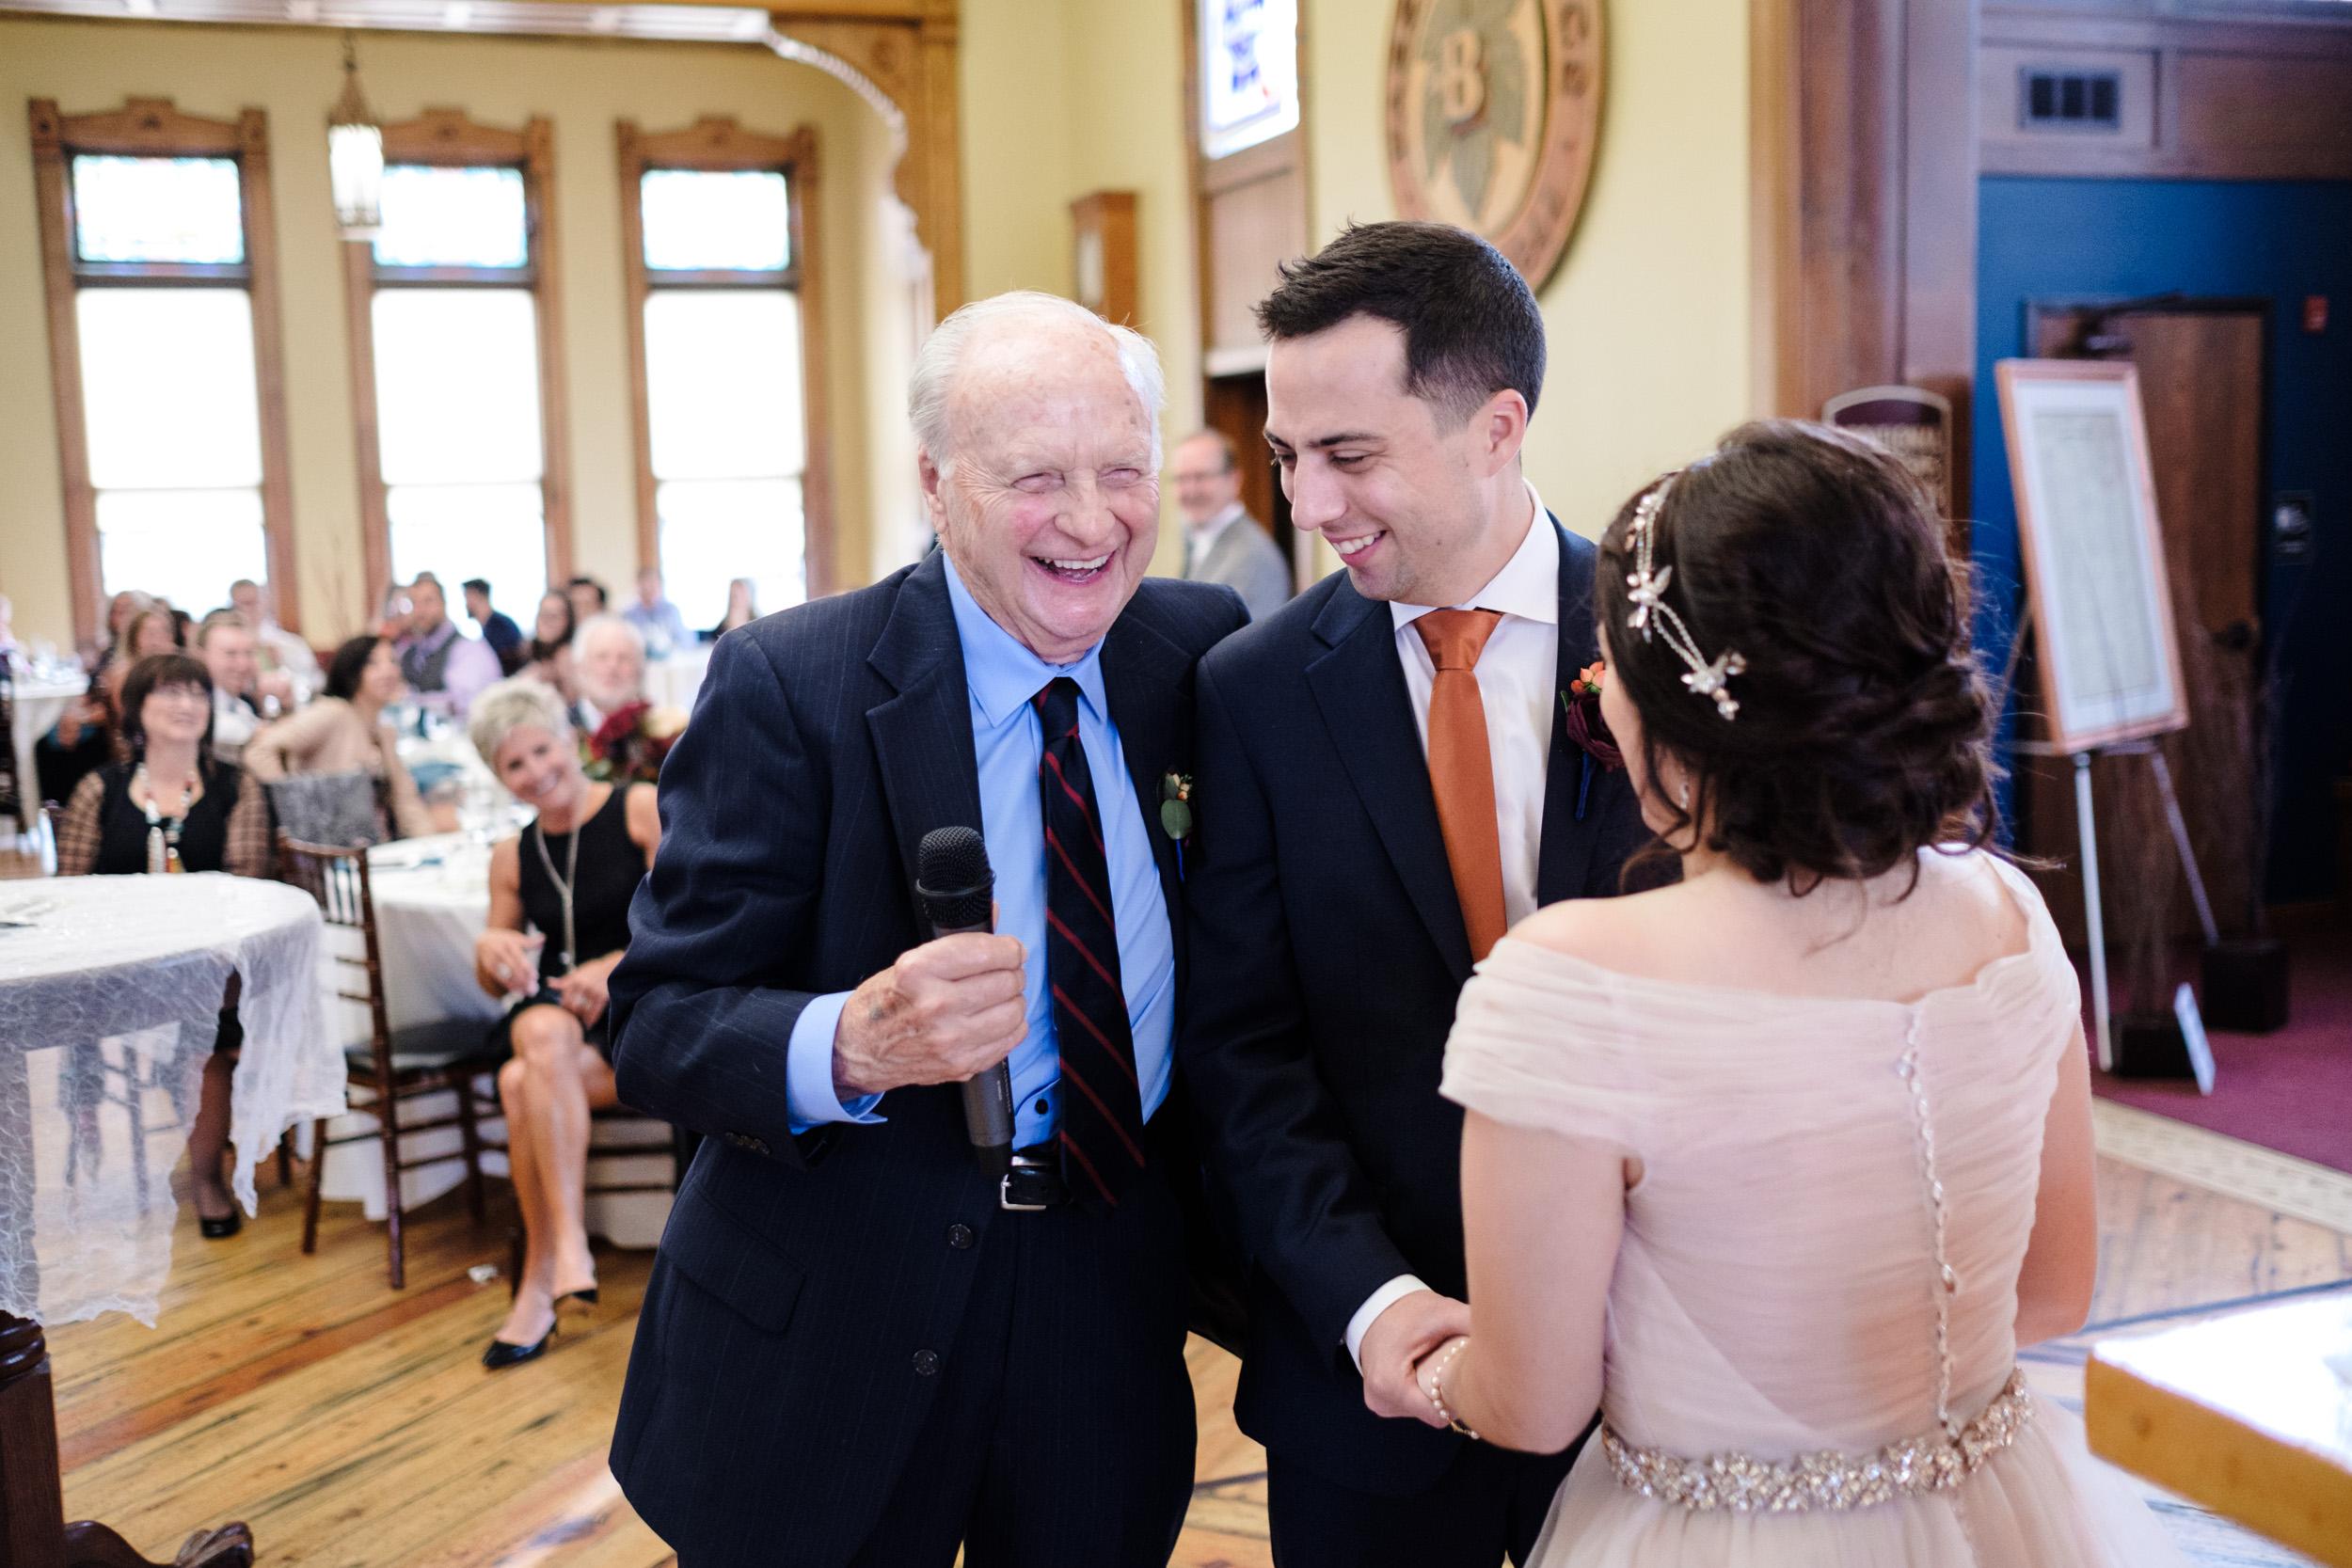 grandfather speech to bride and groom, wisconsin wedding